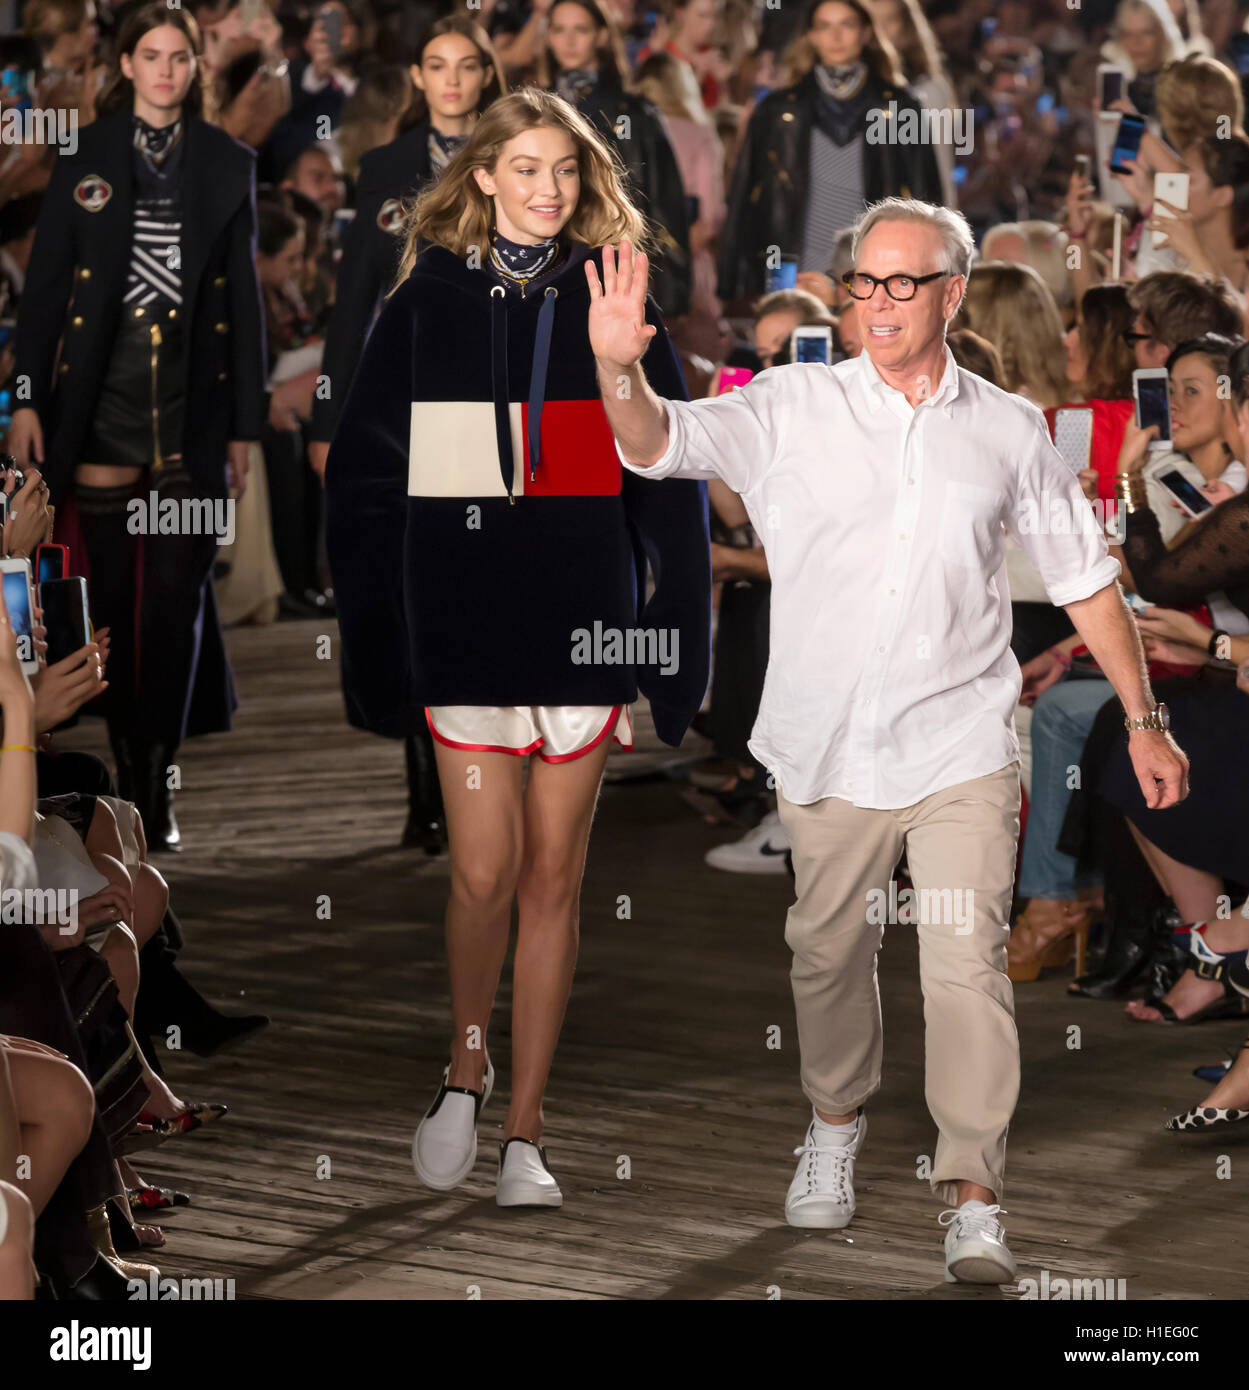 2de2435e NEW YORK, NY - SEPTEMBER 09, 2016: Gigi Hadid and designer Tommy Hilfiger